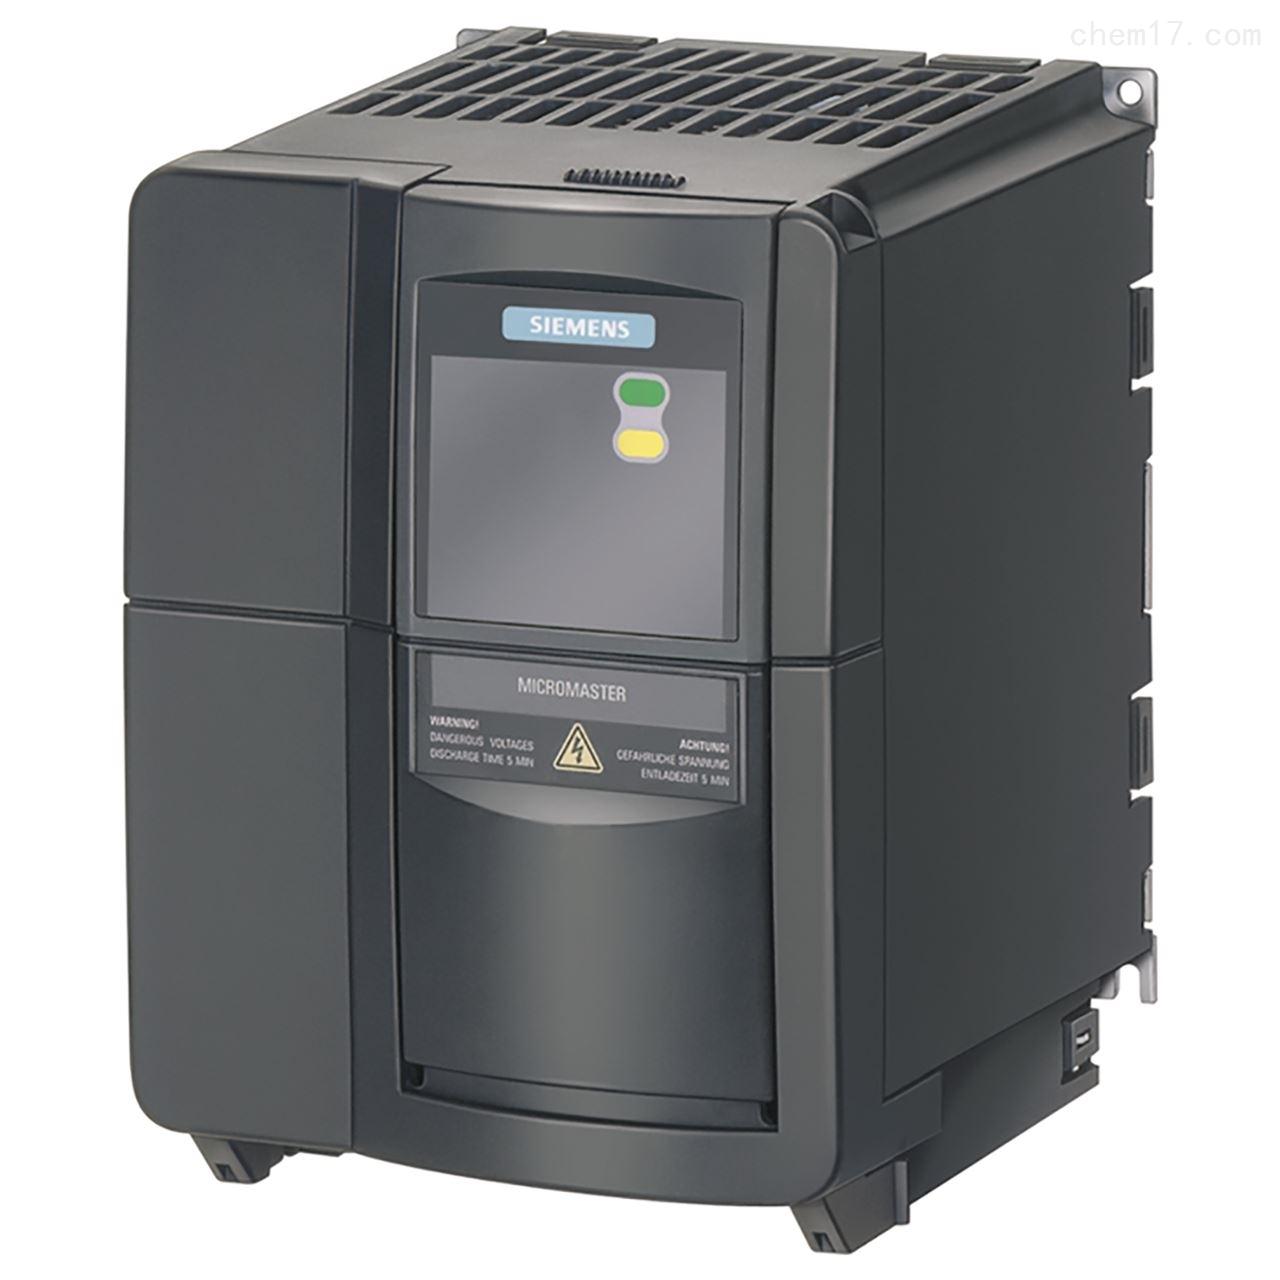 6SE6400-0MD00-0AA0西门子MM440变频器选件